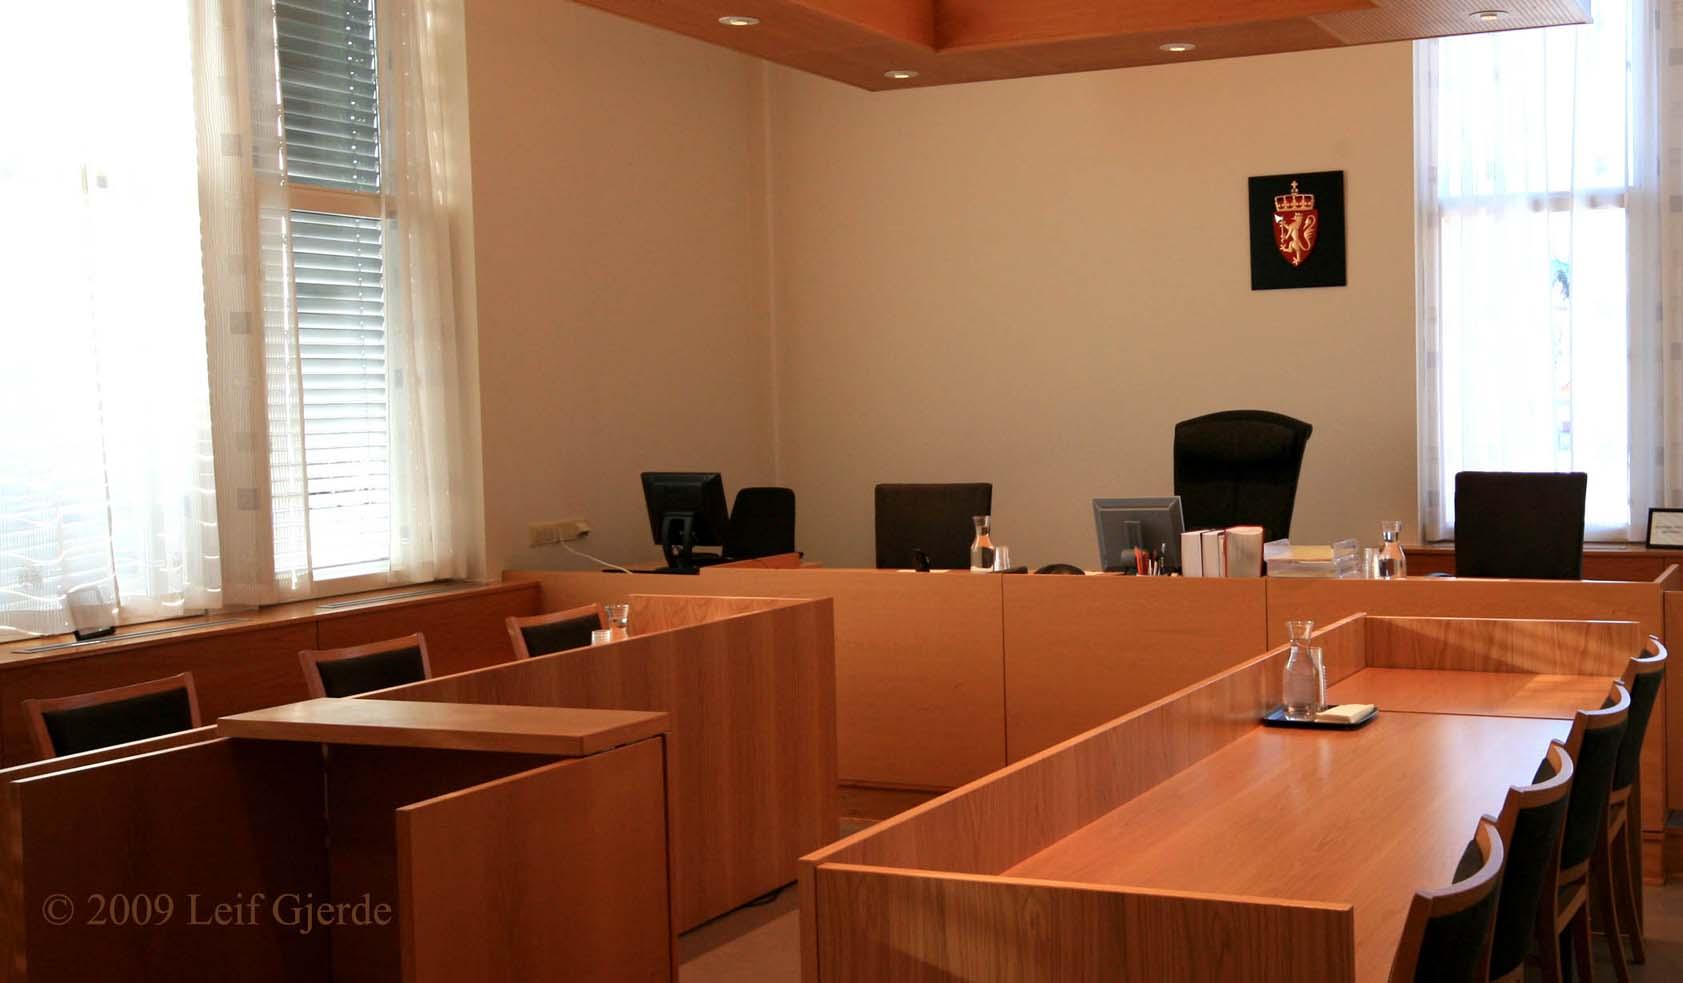 forliksrådet i oslo kommune